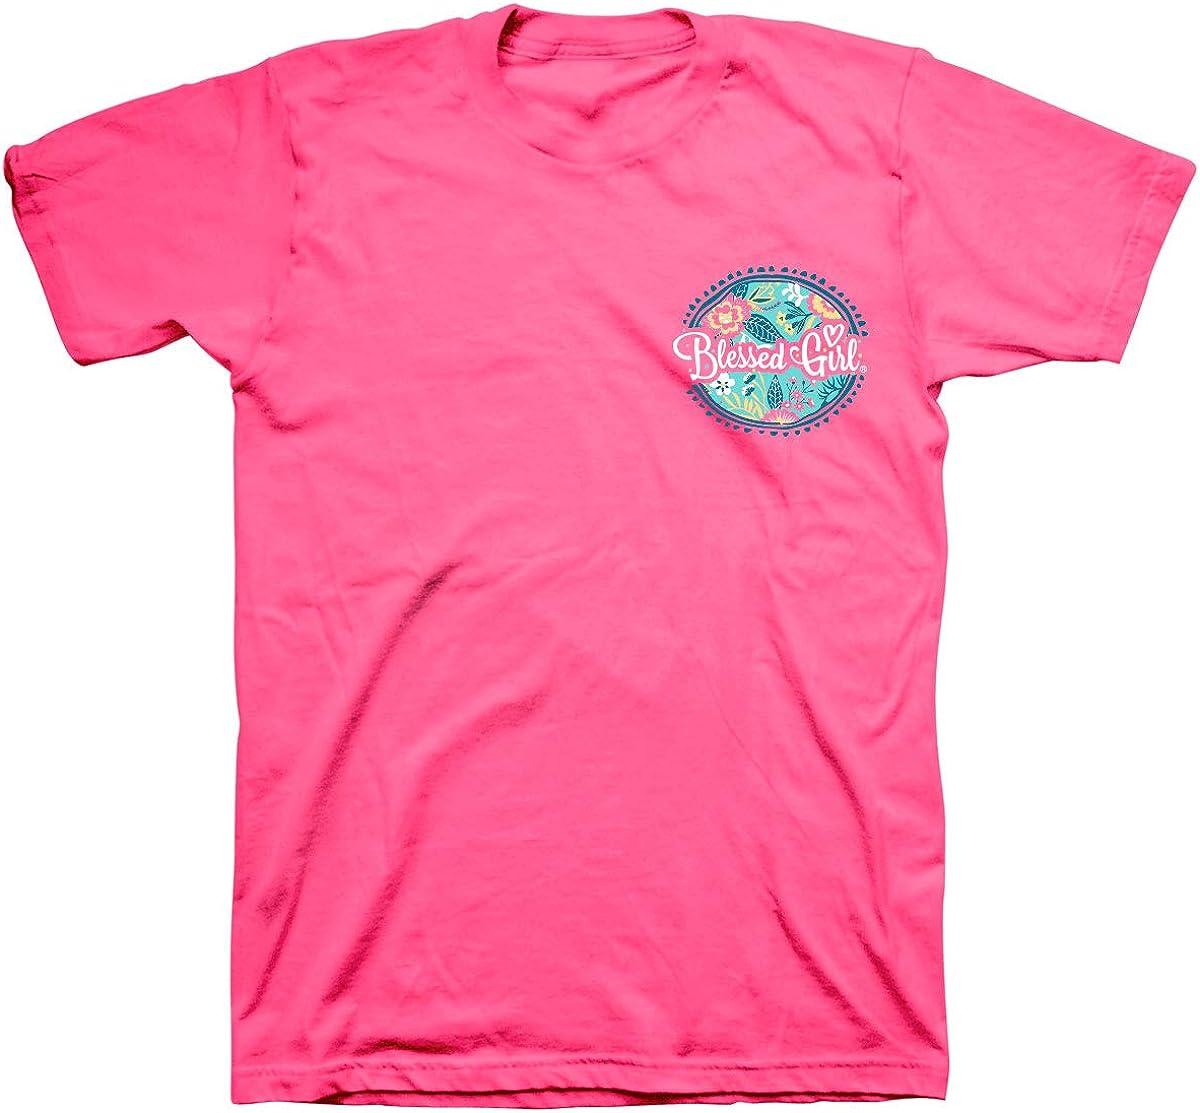 Blessed Girl - Camiseta para Mujer, diseño Cristiano, Color Rosa neón